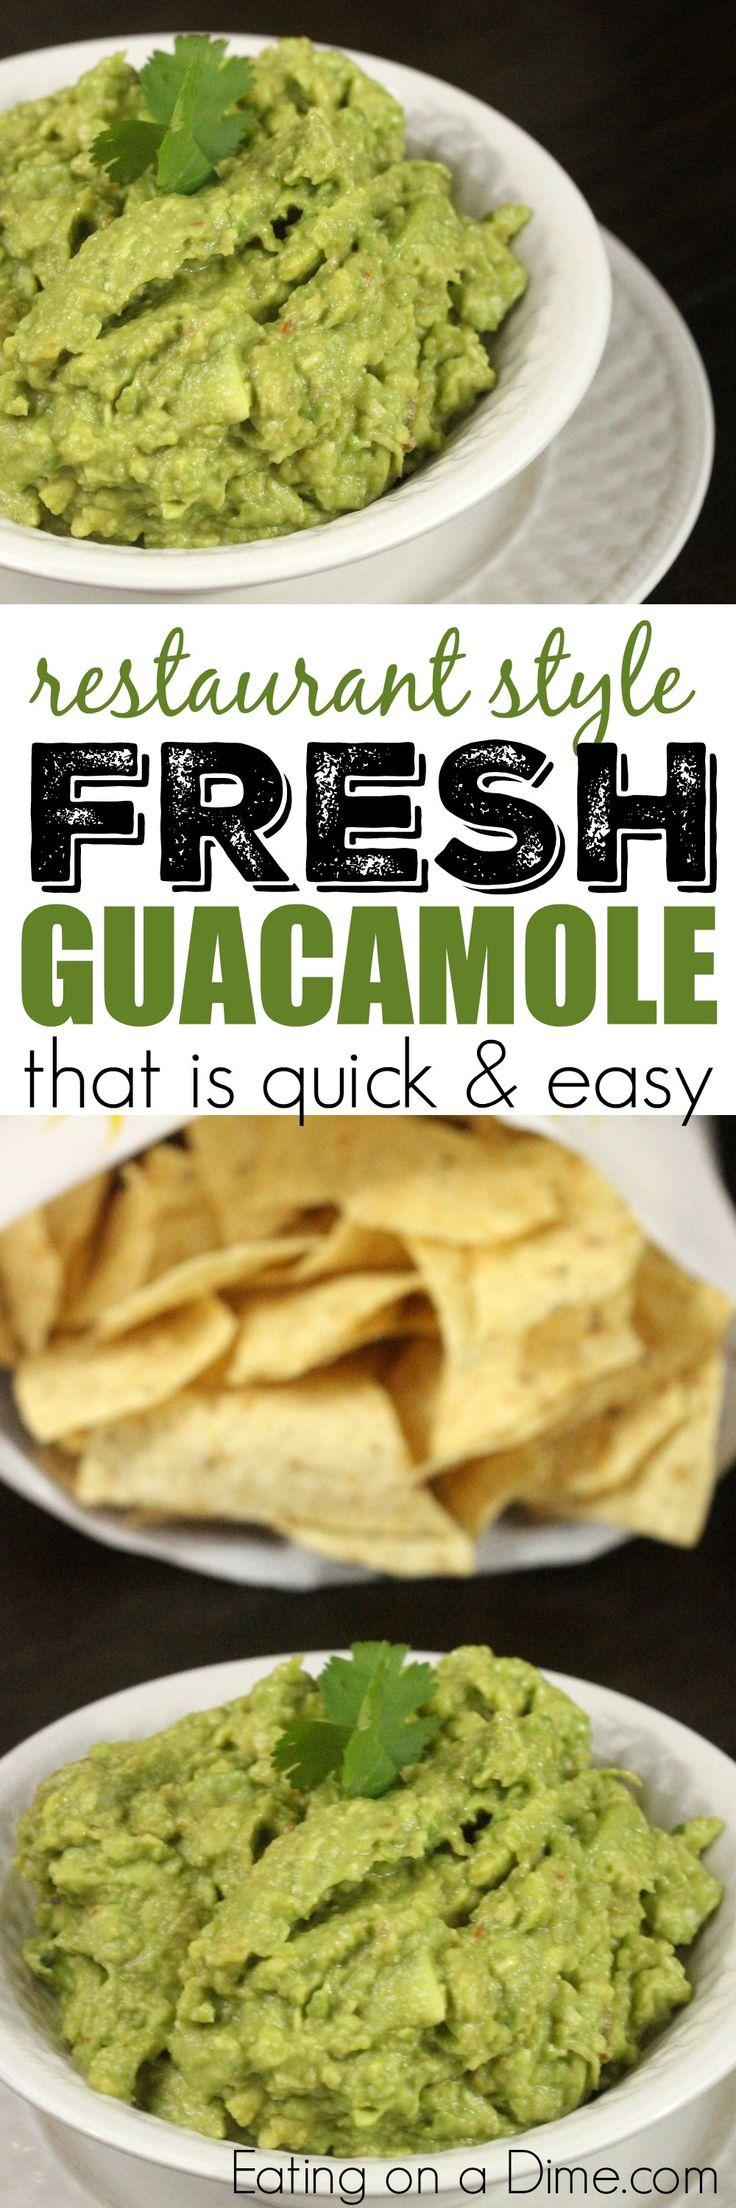 We love this Very Simple Guacamole Recipe